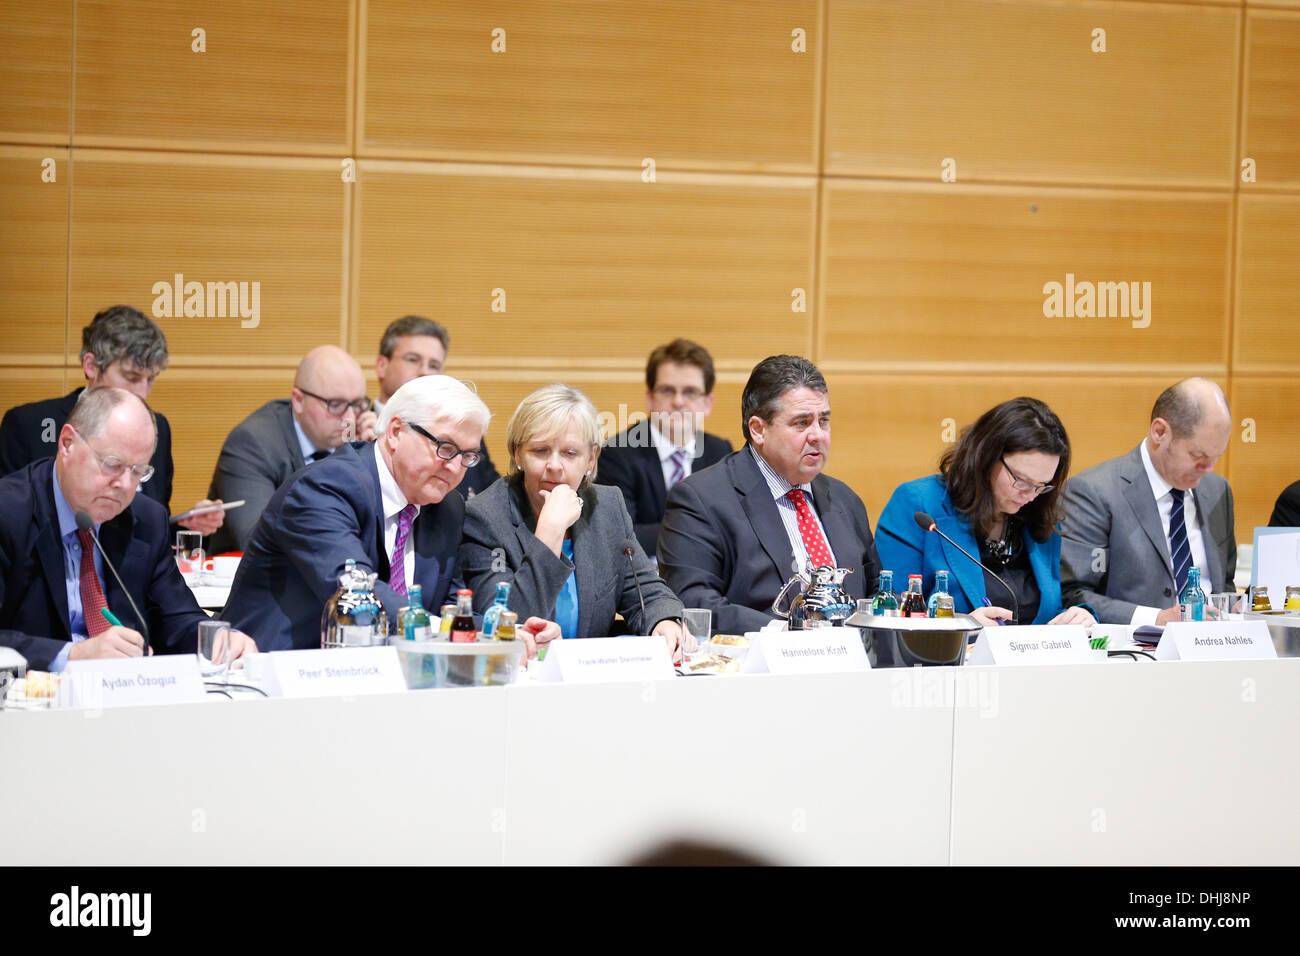 Berlin, Germany. 11th Nov, 2013. Berlin, Germany. 11th November, 2013. CDU/CSU and SPD continue the coalition negotiations at SPD Central Pertei in Berlin. / Picture: Peer Steinbrueck (SPD), Frank-Walter Steinmeier (SPD), Hannelore Kraft (SPD), Sigmar Gabriel (SPD), SPD Chairman, and Andrea Nahles (SPD), during the negotiations in Berlin, on November 11, 2013.Photo: Reynaldo Paganelli/NurPhoto Credit:  Reynaldo Paganelli/NurPhoto/ZUMAPRESS.com/Alamy Live News - Stock Image